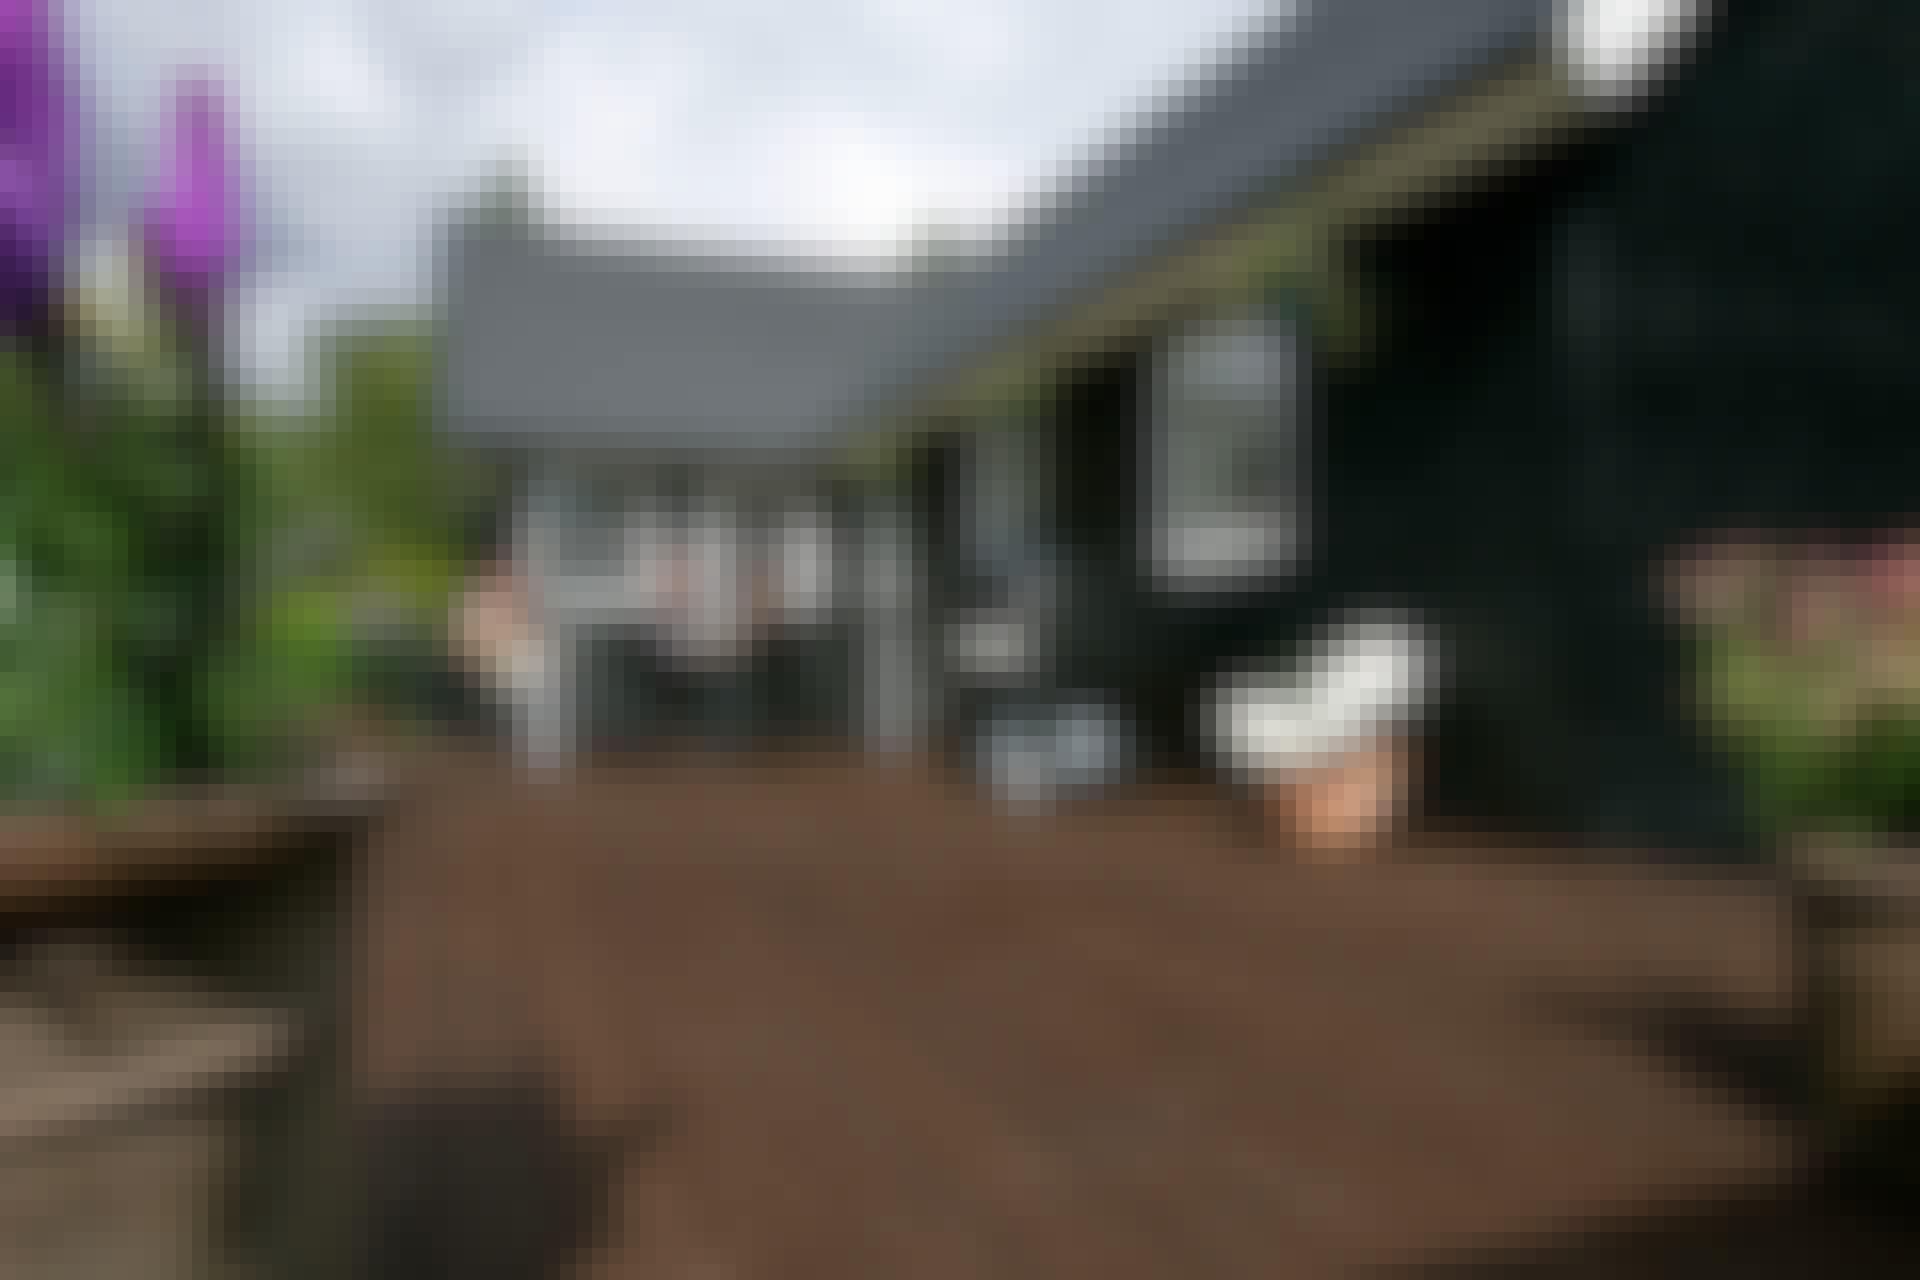 Terrasse uden synlige skruer